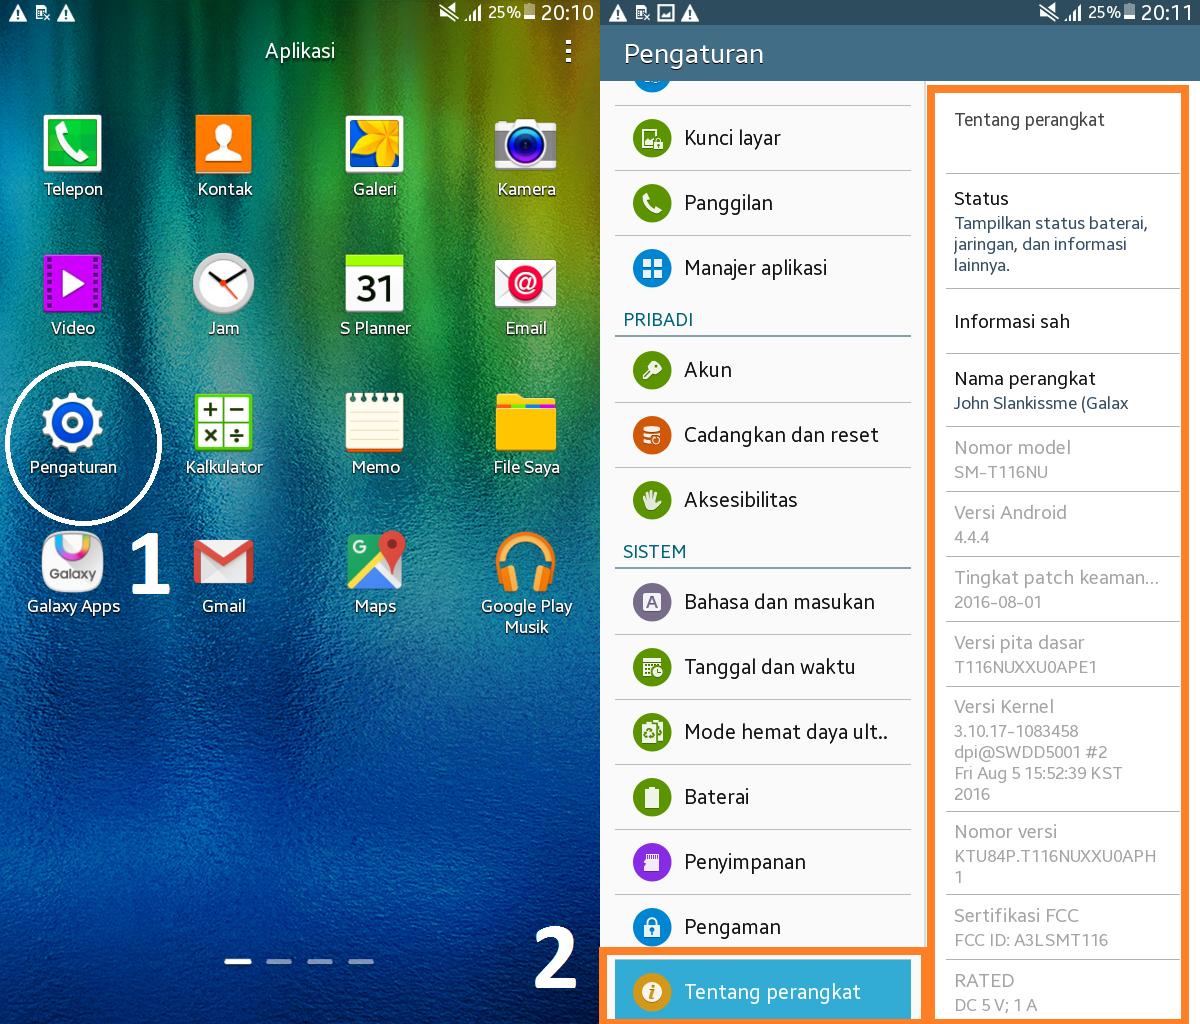 Cara Cek Tipe Hp Samsung Android Terbaru Jadul Lengkap Semutimut Tutorial Hp Dan Komputer Terbaik